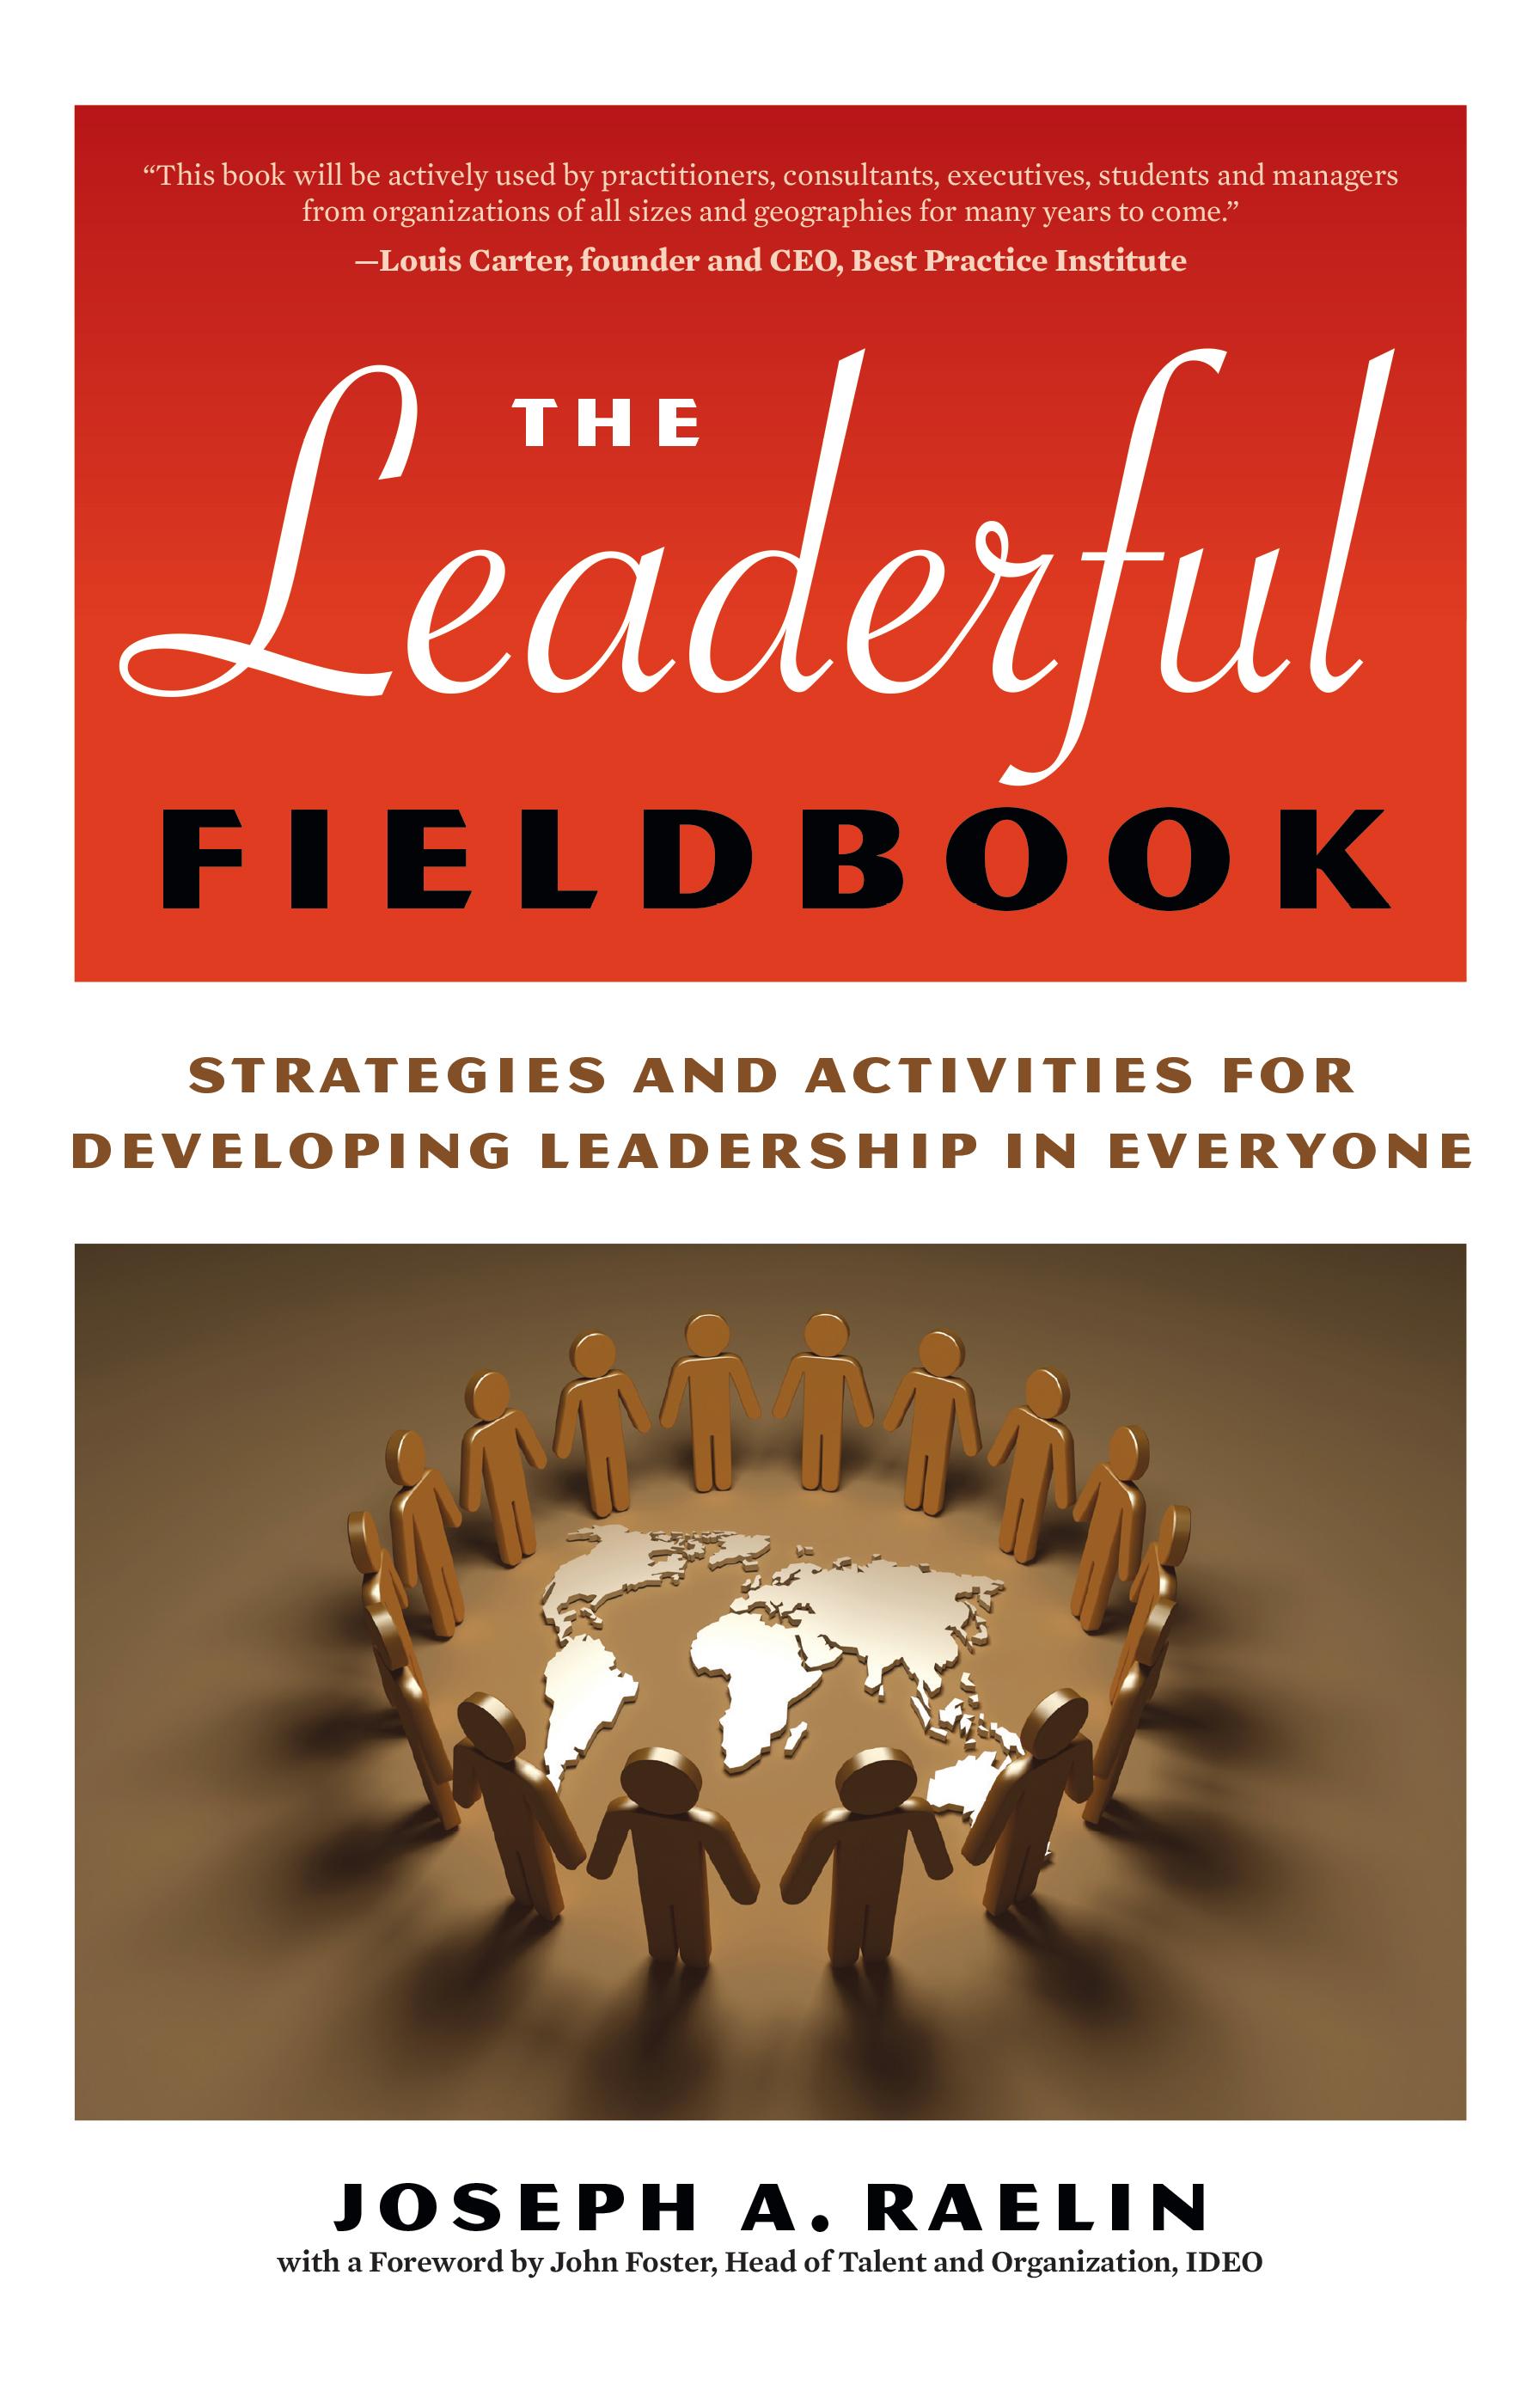 NEW ISBN LeaderfulFieldbookTPB_US.jpg